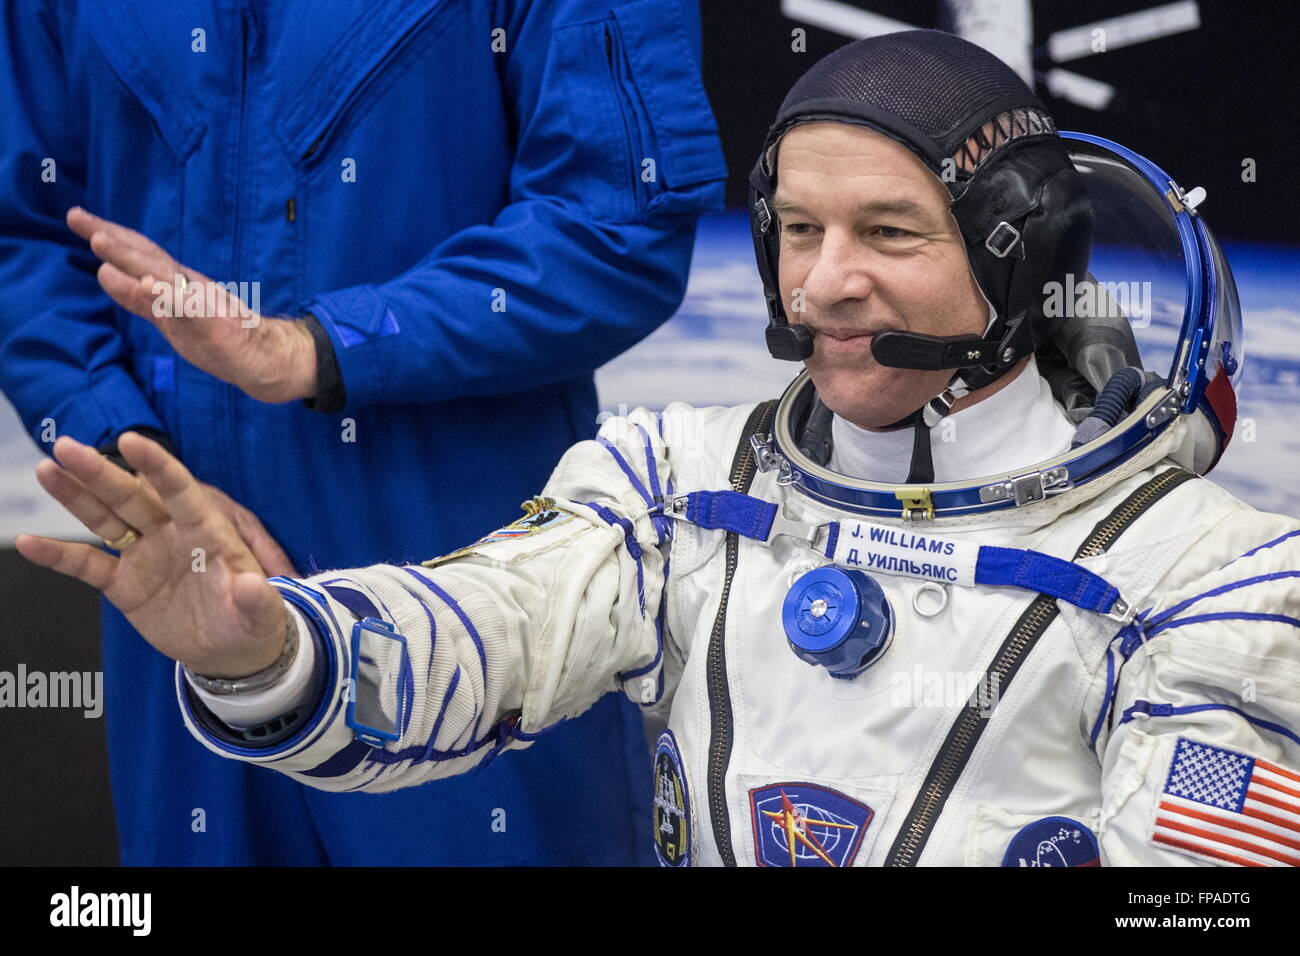 Baikonur, Kazakhstan. 18th Mar, 2016. Crew member of Expedition 47/48, NASA astronaut Jeffrey Jeff Williams gestures - Stock Image